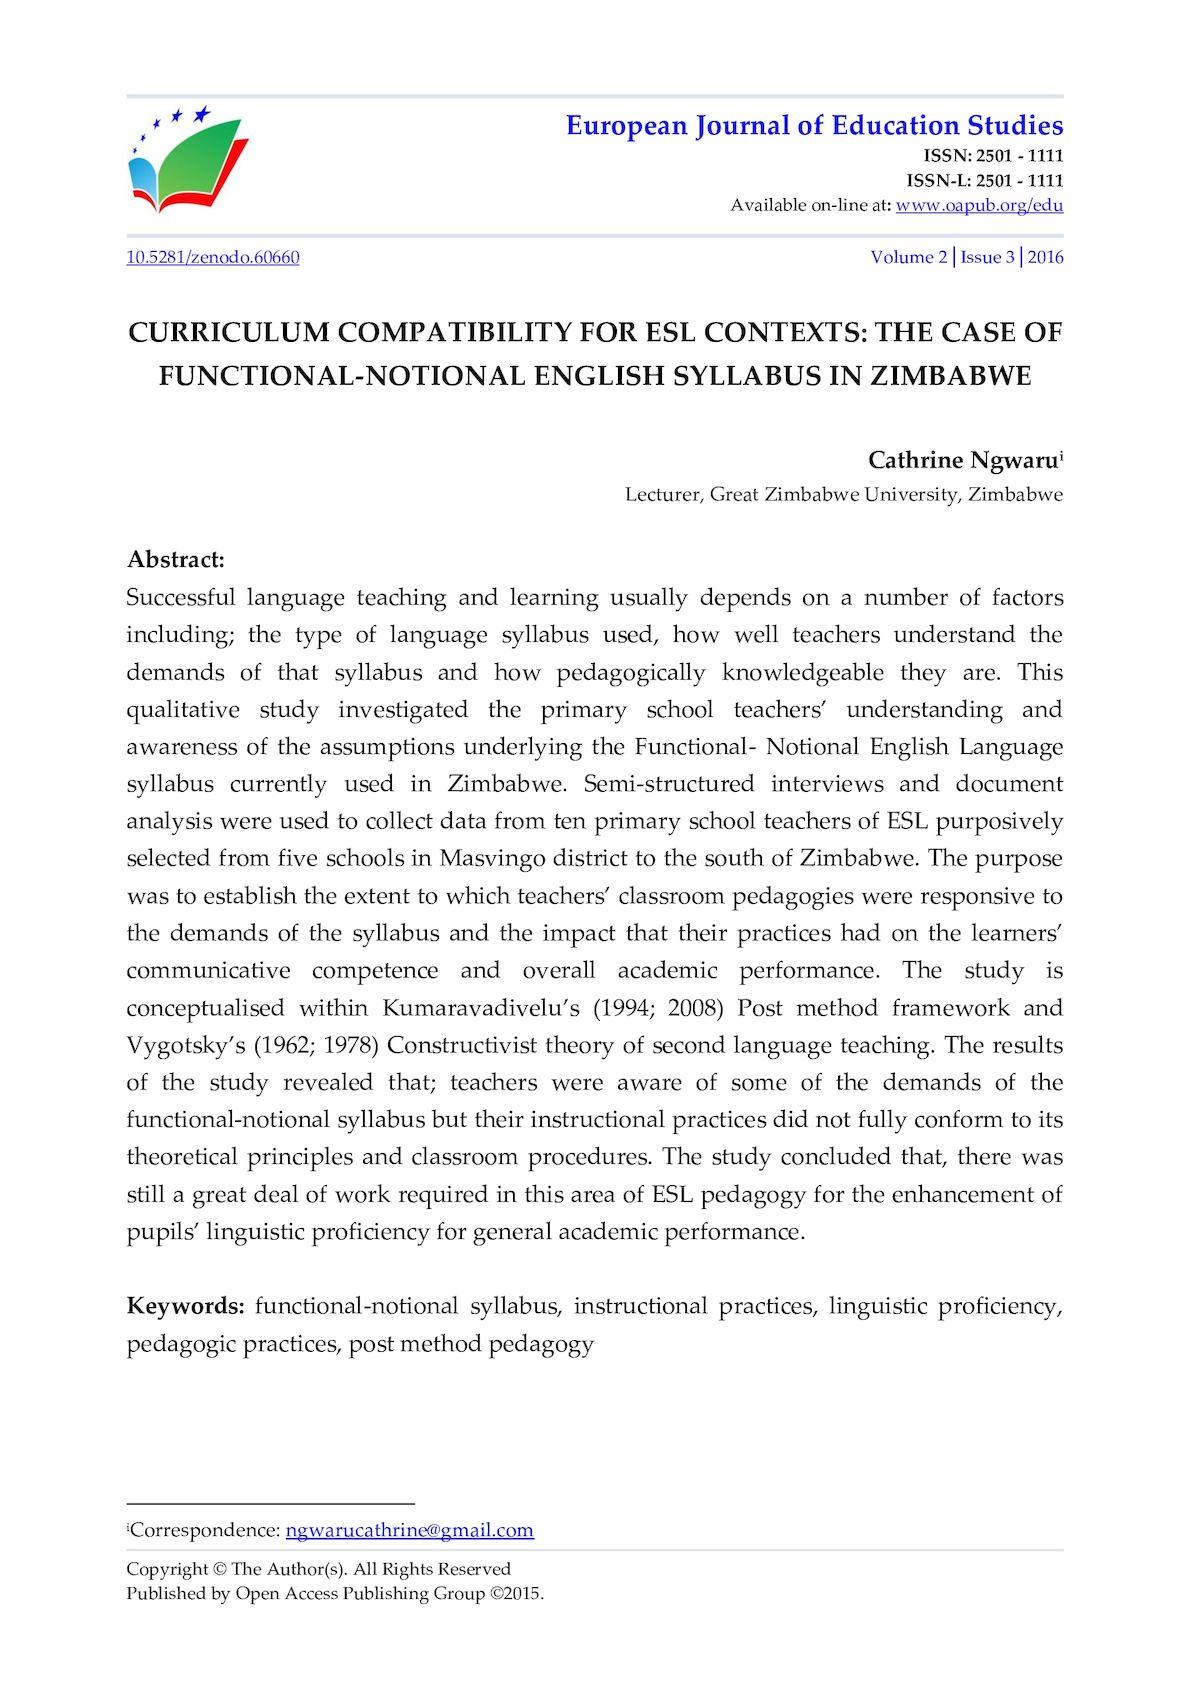 Calaméo - CURRICULUM COMPATIBILITY FOR ESL CONTEXTS: THE